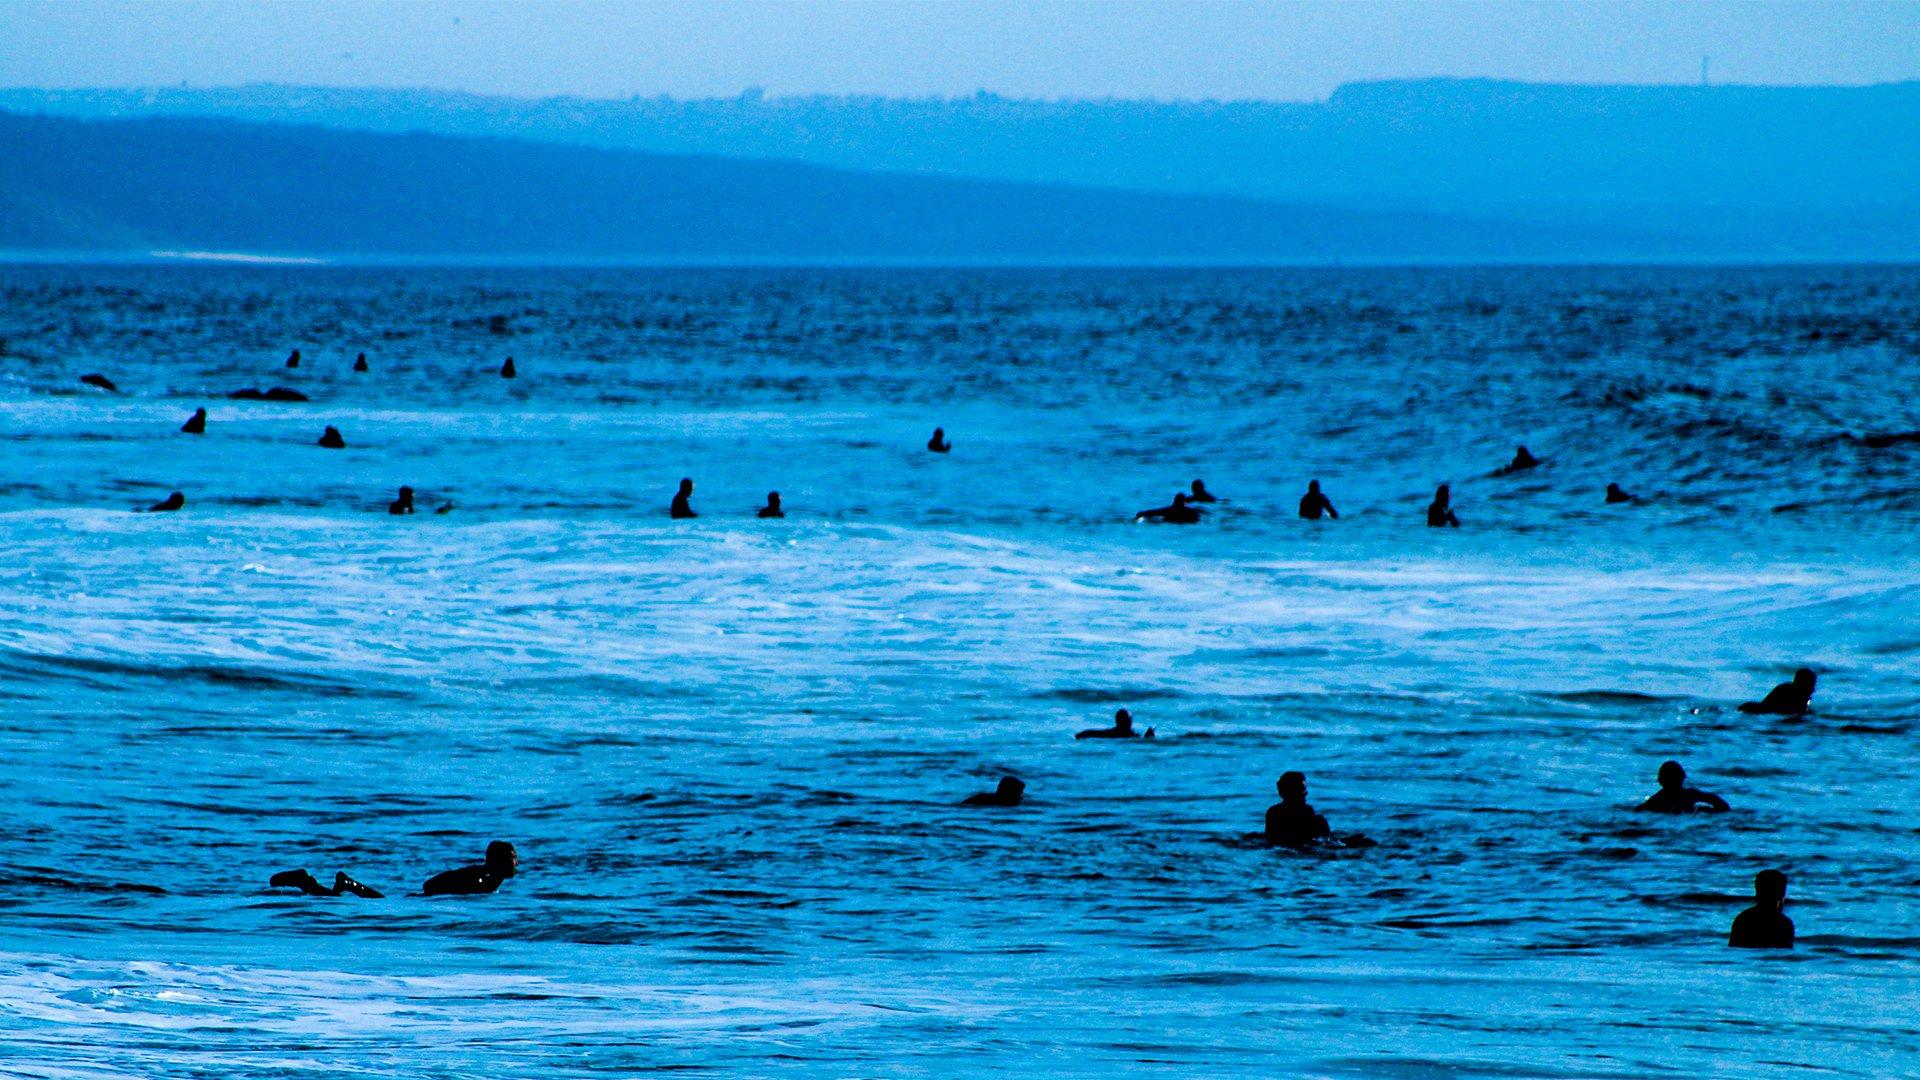 dan-padrino-danpadrino-meditation-mindfulness-instructor-surfing-mindsurfing-mind-surfing-technique-09